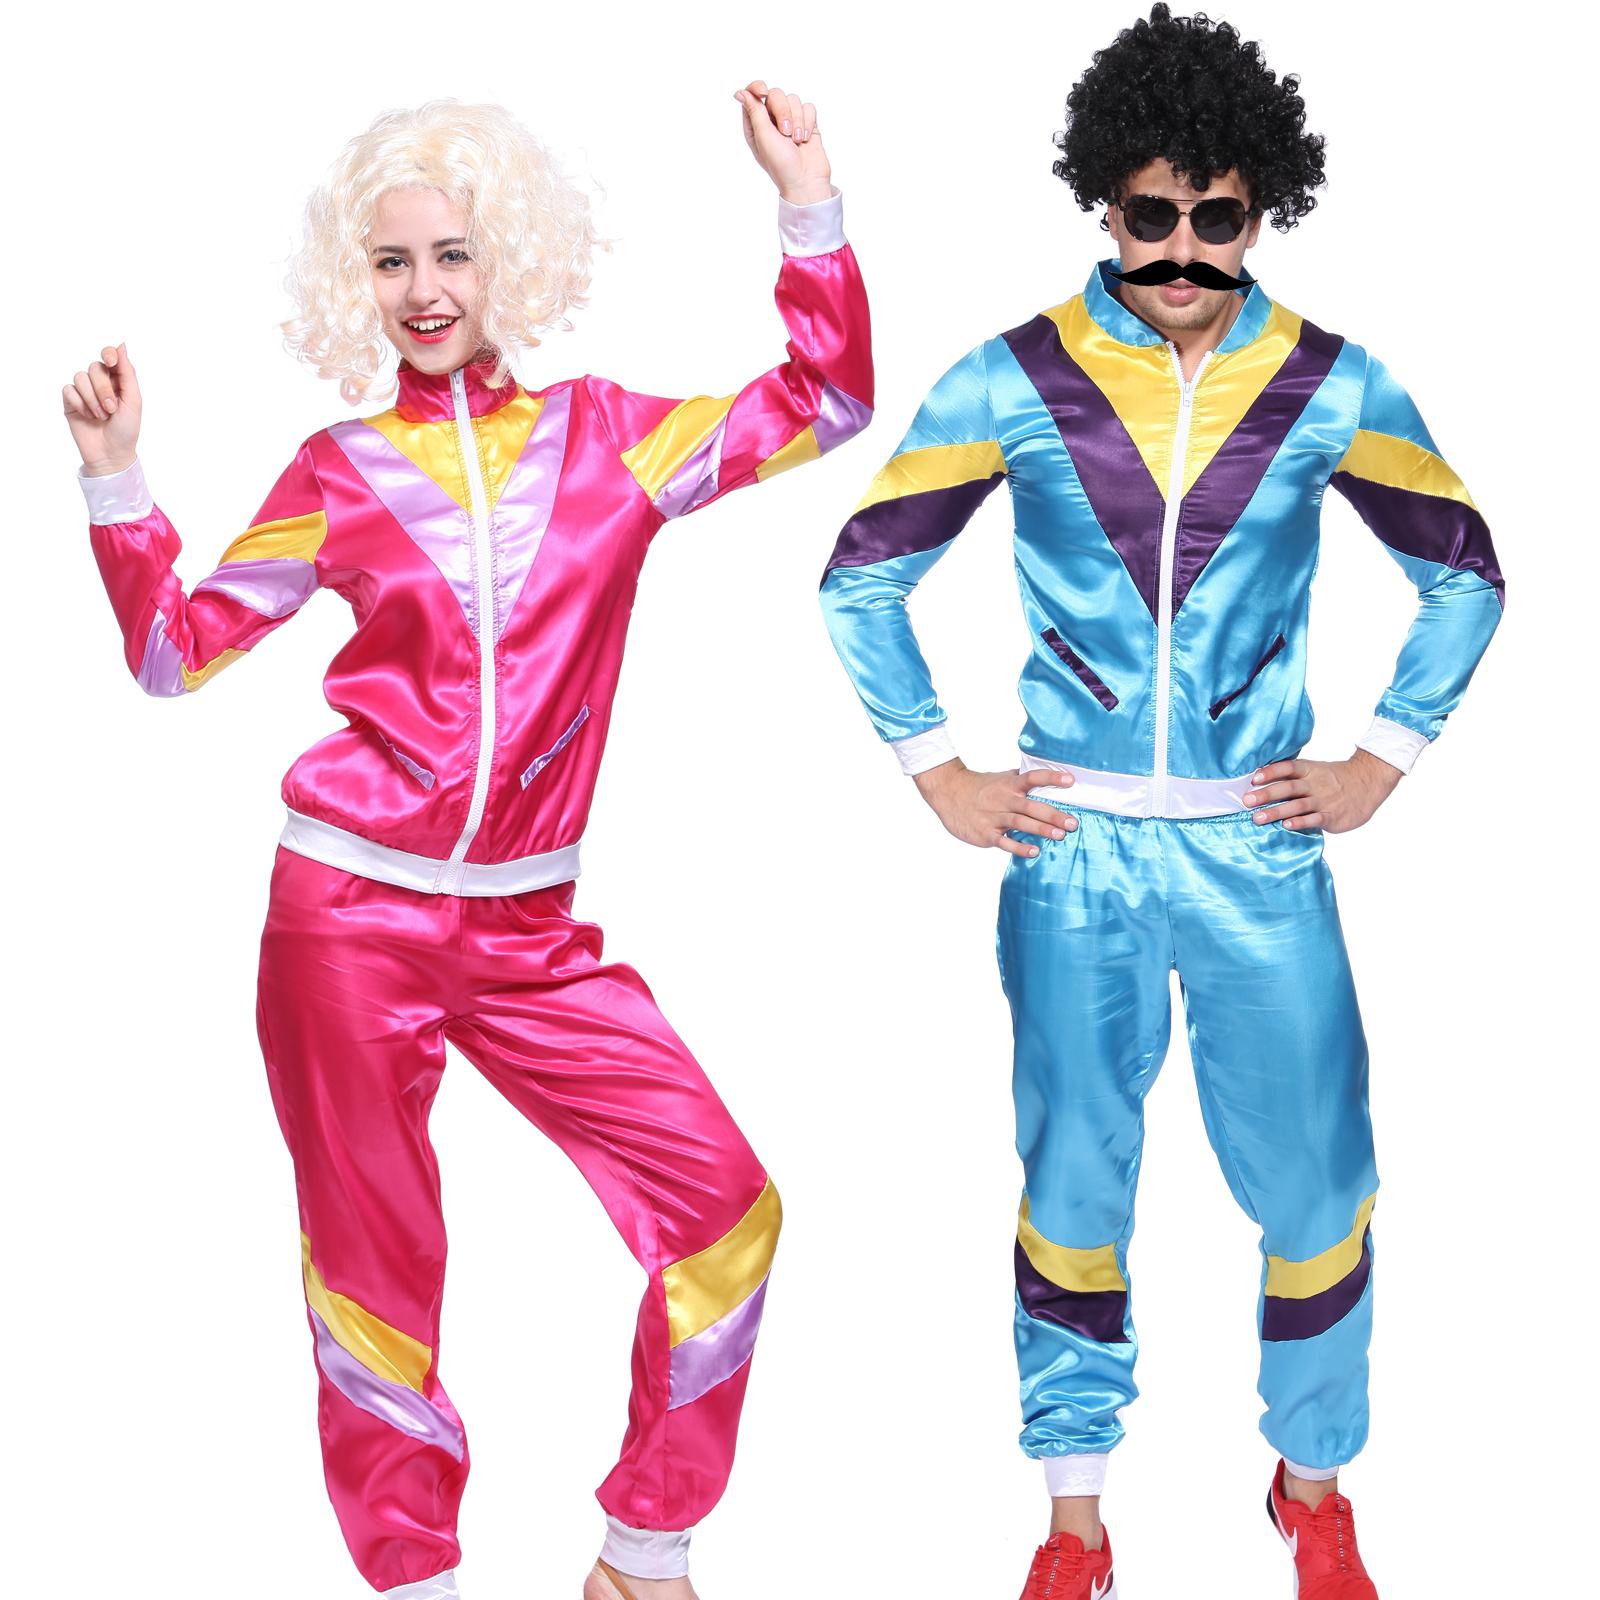 karneval mottoparty kost m damen herren 80er trainingsanzug assianzug sportler ebay. Black Bedroom Furniture Sets. Home Design Ideas